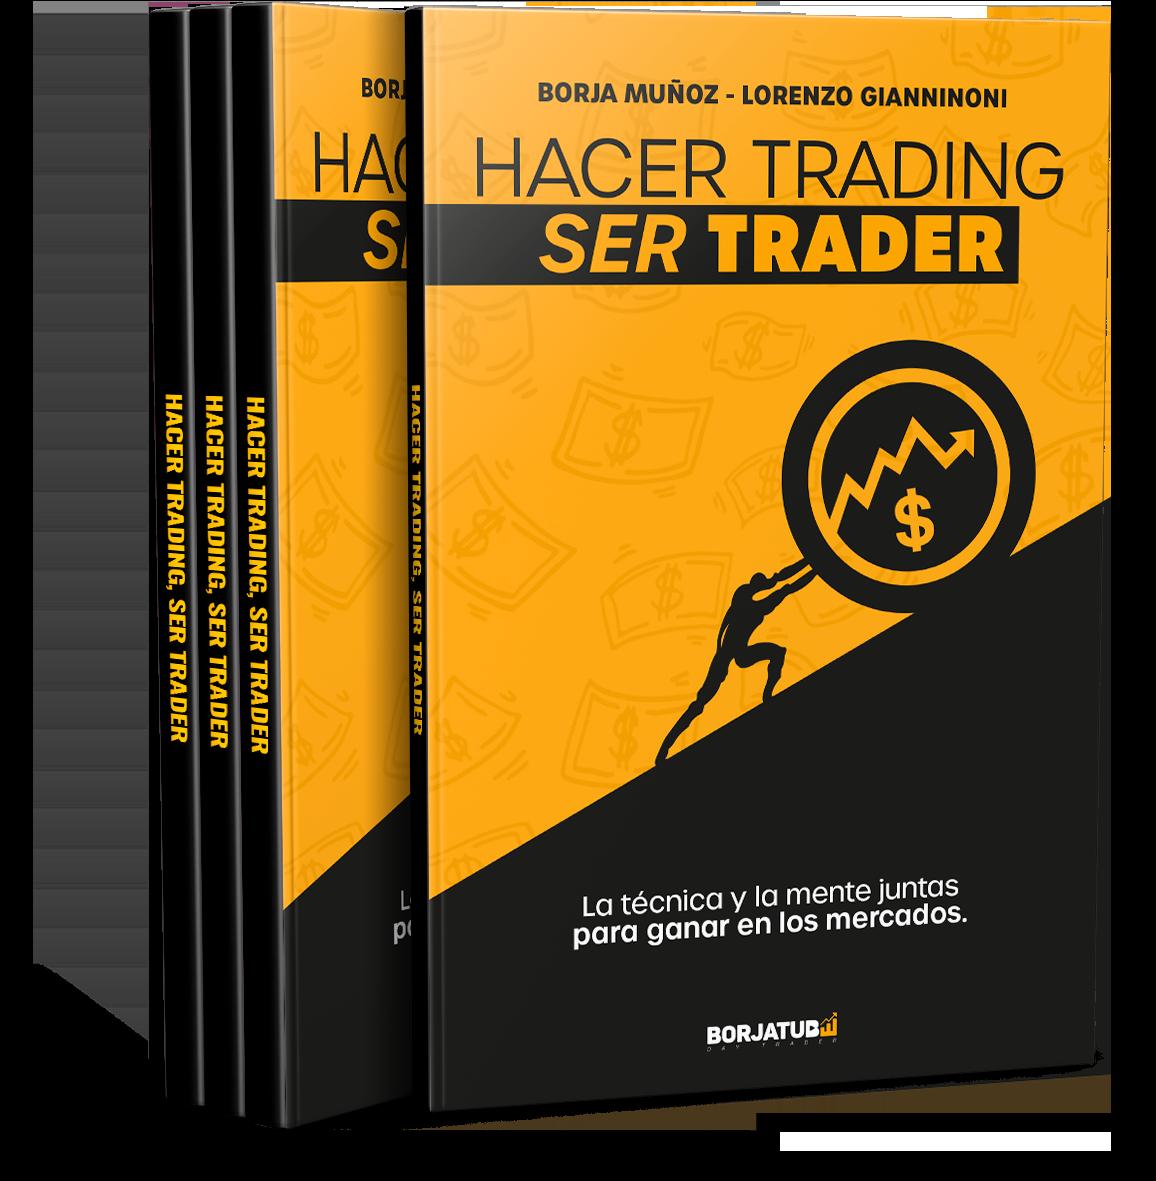 Libros de trading | Borjatube | Hacer trading, ser trader